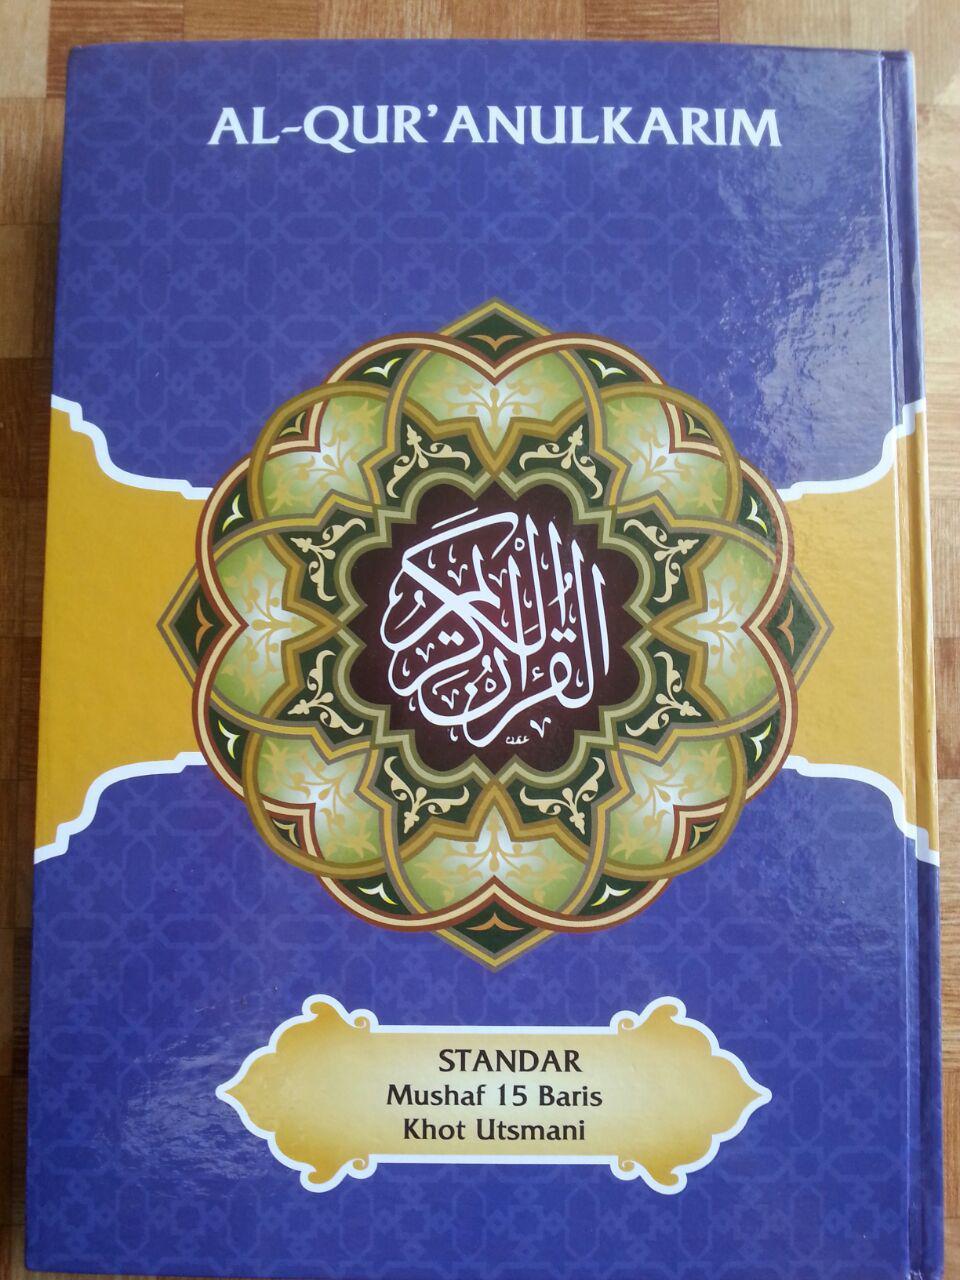 Al-Qur'an Mushaf Lamina Standar Mushaf 15 Baris Khot Utsmani B5 cover